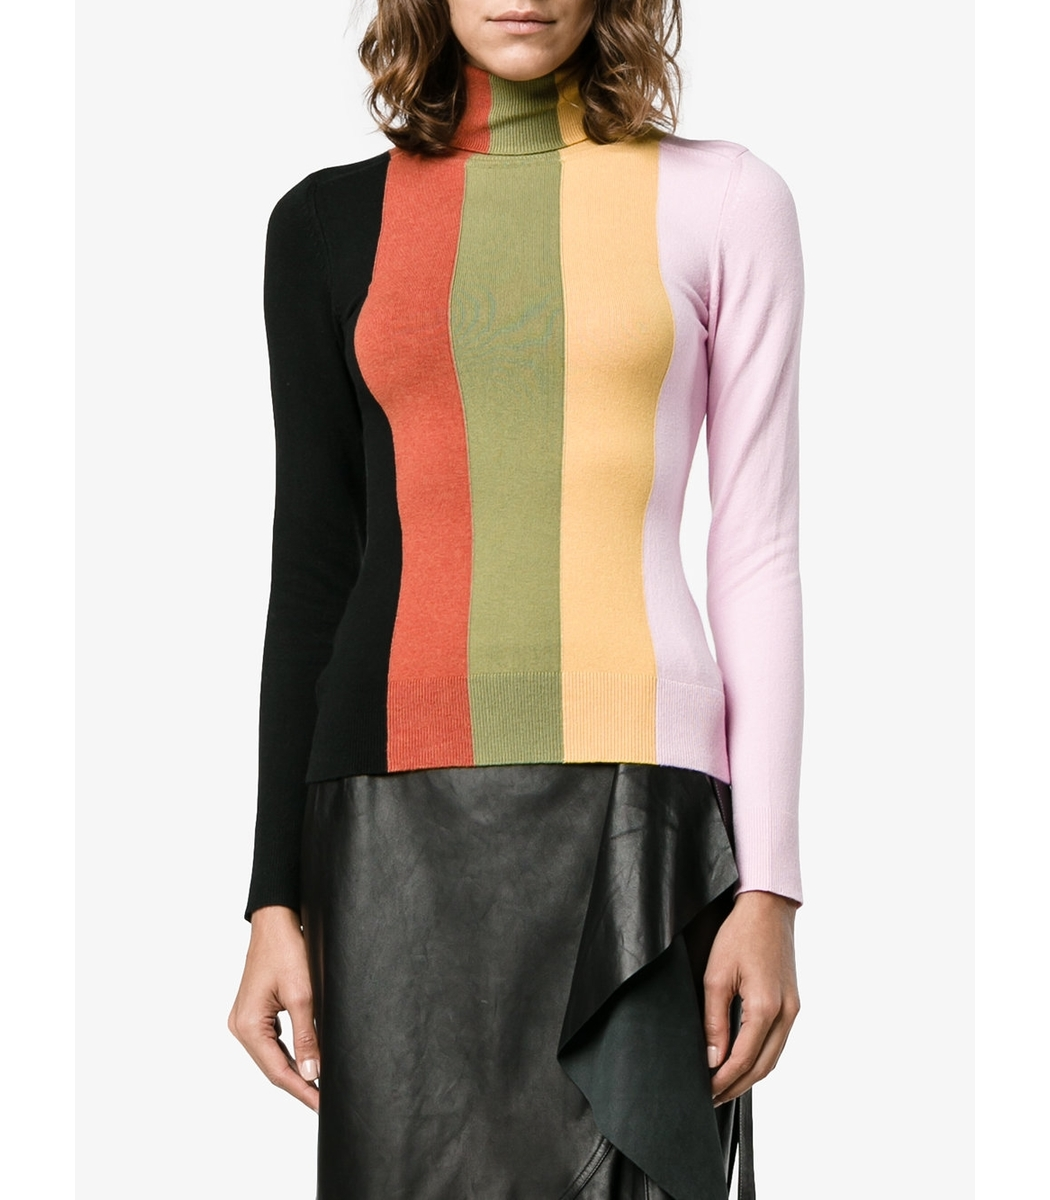 Joos Tricot Multicolor Striped Sweater - Multicolor Striped Sweater